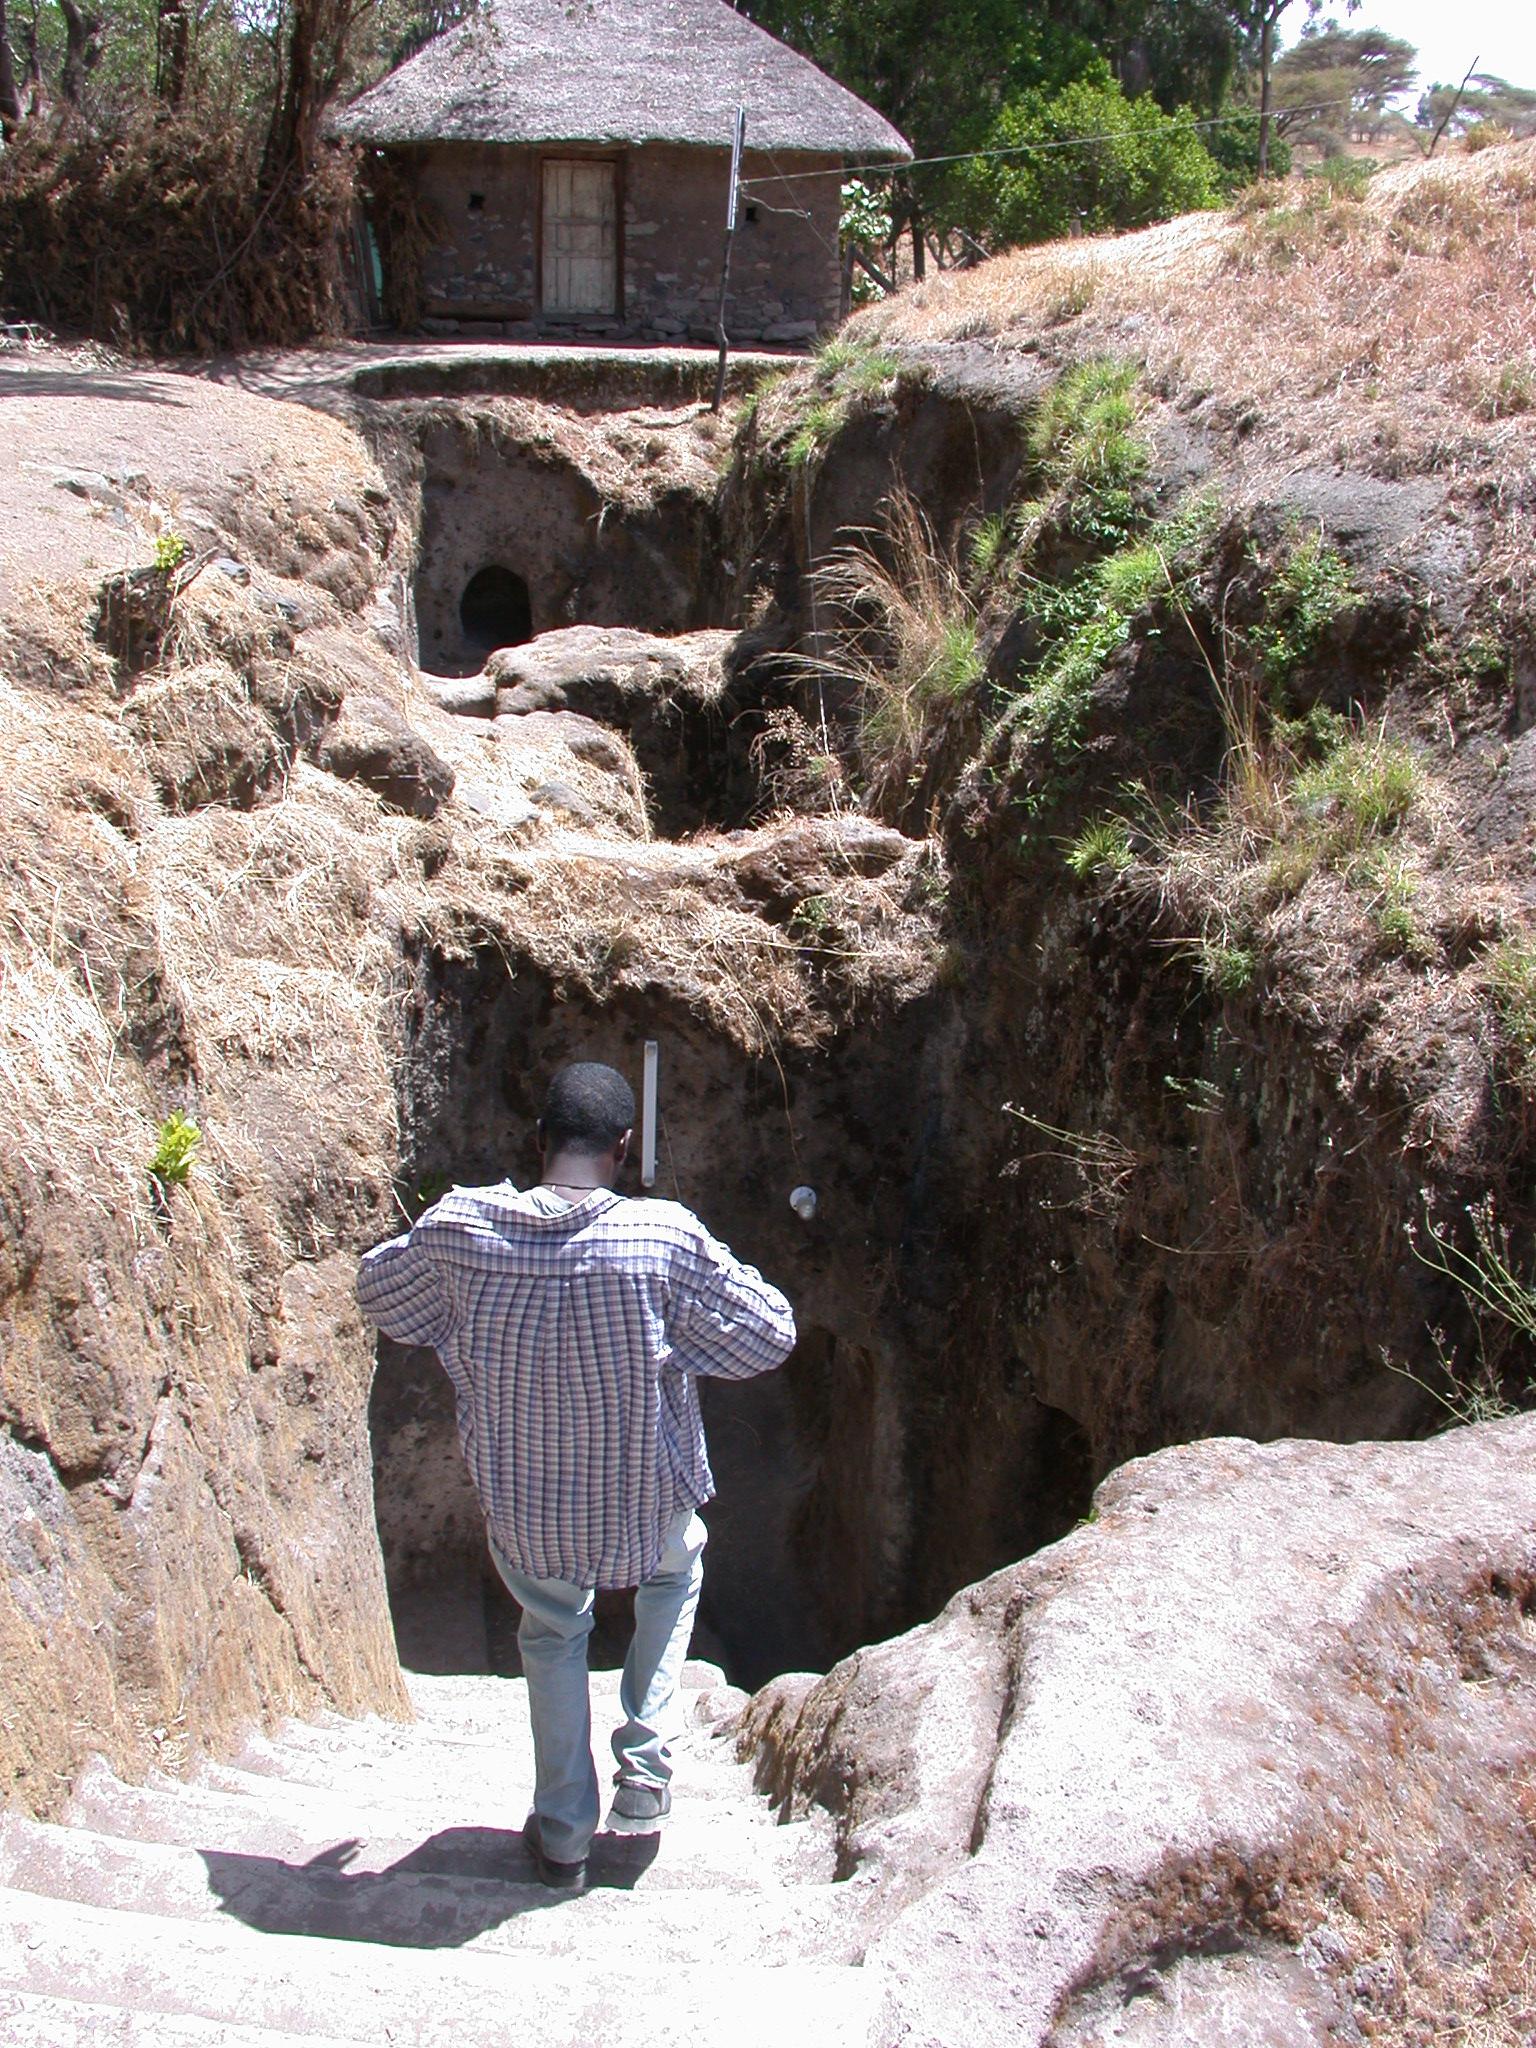 Stairway to Enter Adadi Mariam Church, South of Addis Ababa, Ethiopia